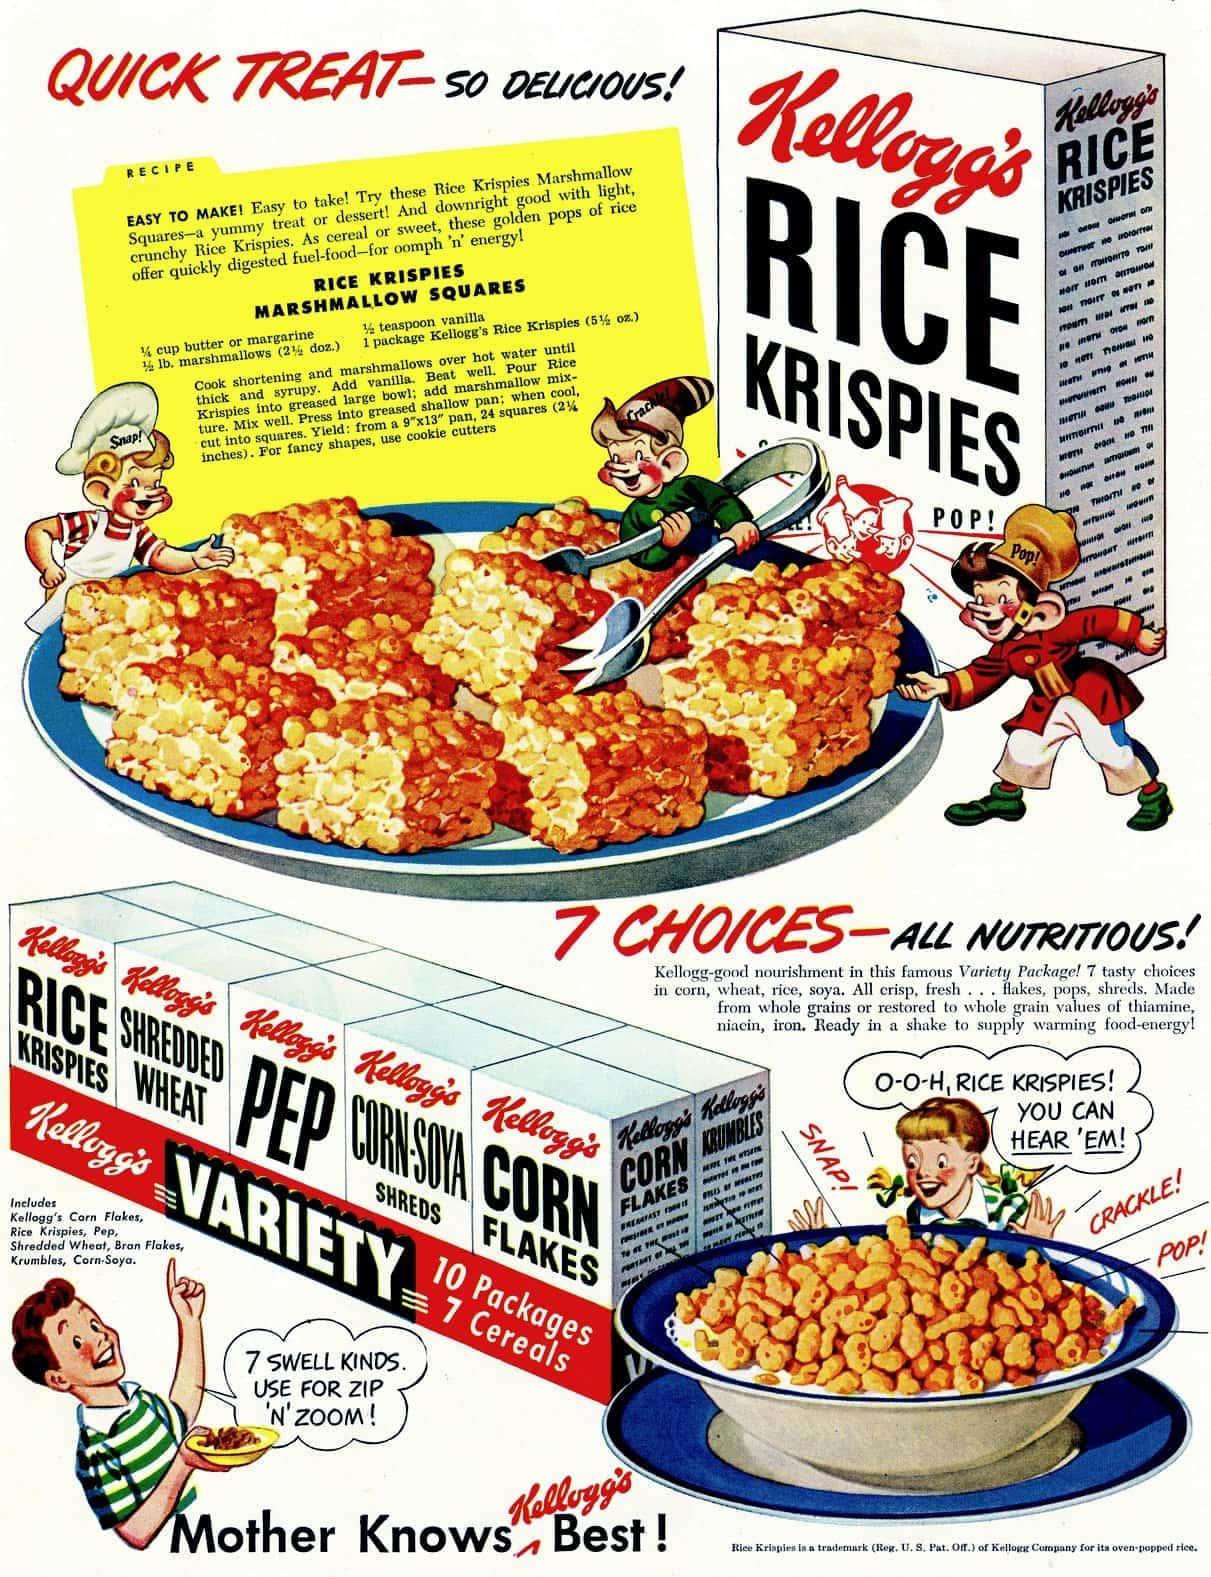 (1948) Original Rice Krispies Marshmallow Squares